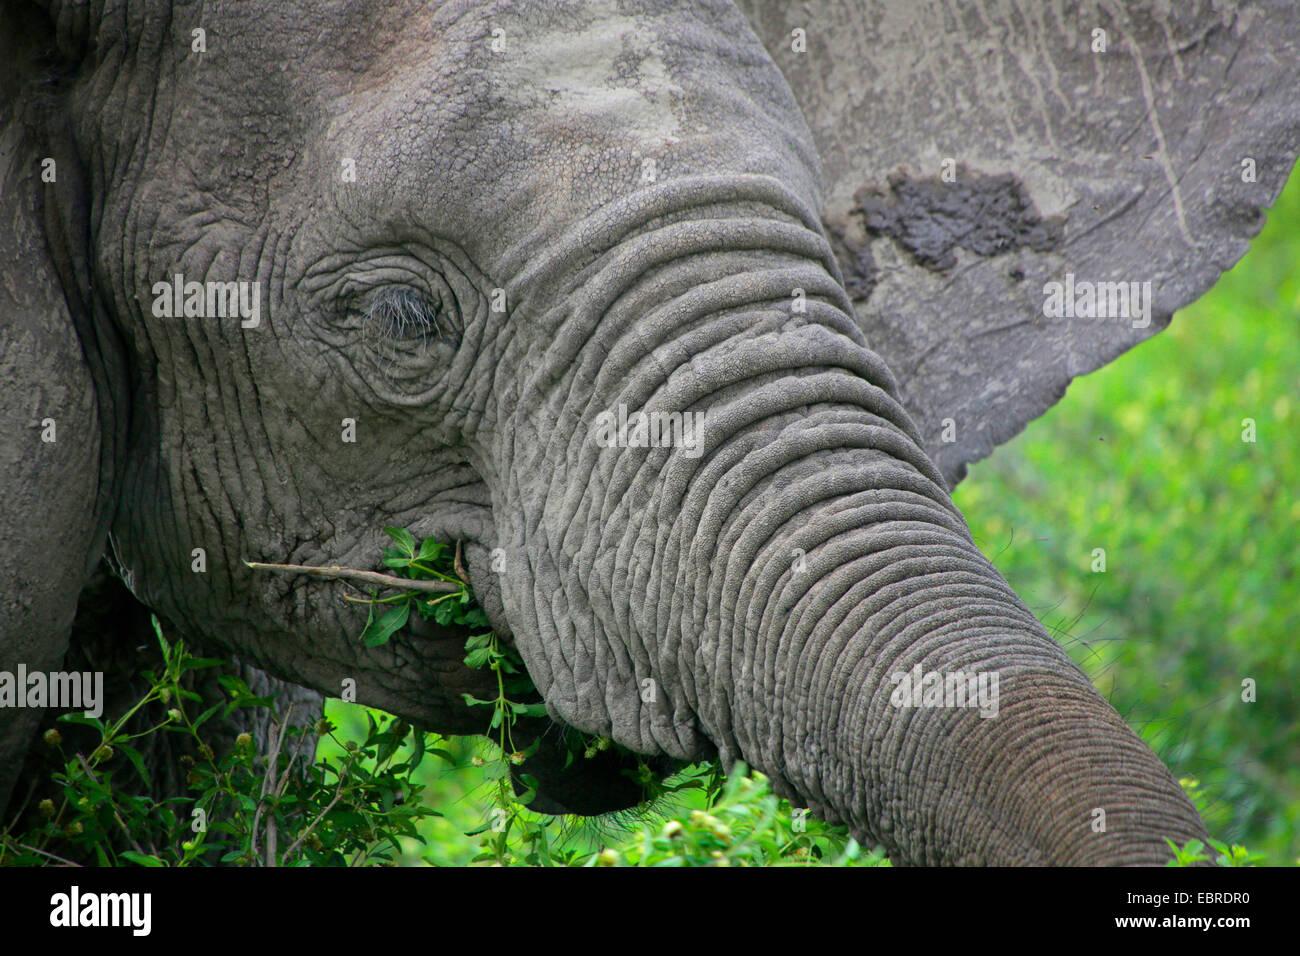 African elephant (Loxodonta africana), portrait, feeding, Tanzania, Serengeti National Park Stock Photo